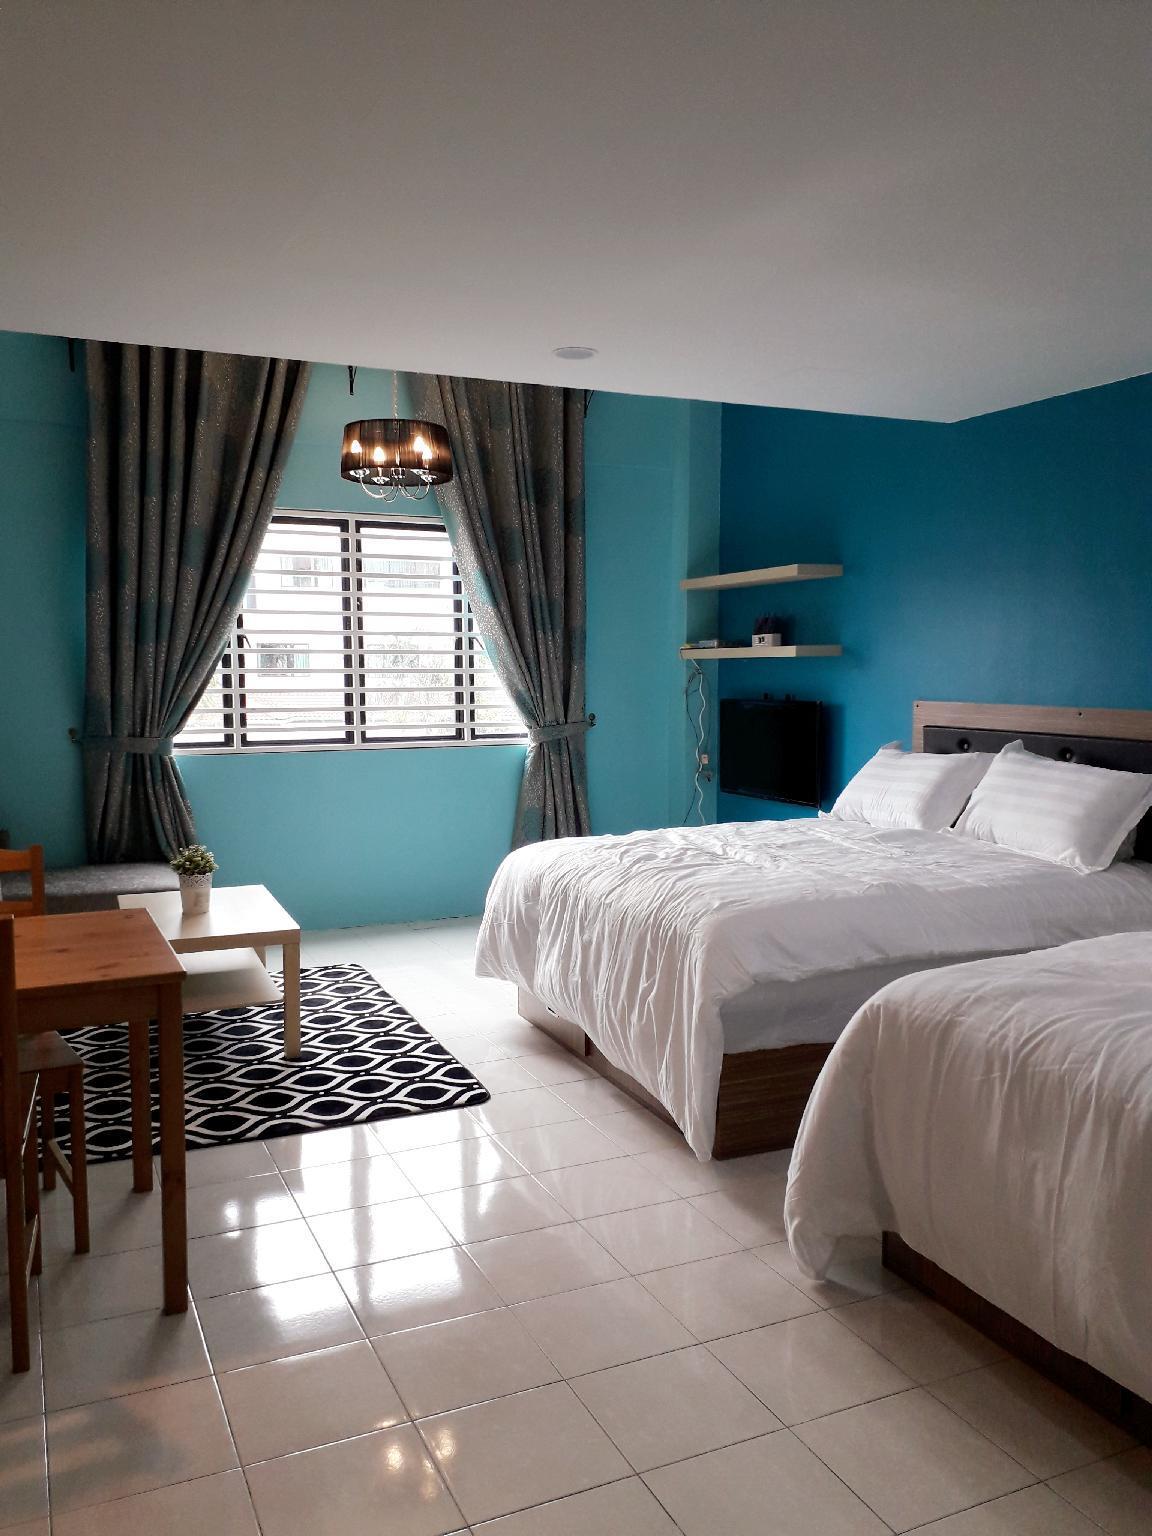 Cozy Studio Apartment With Free Wifi